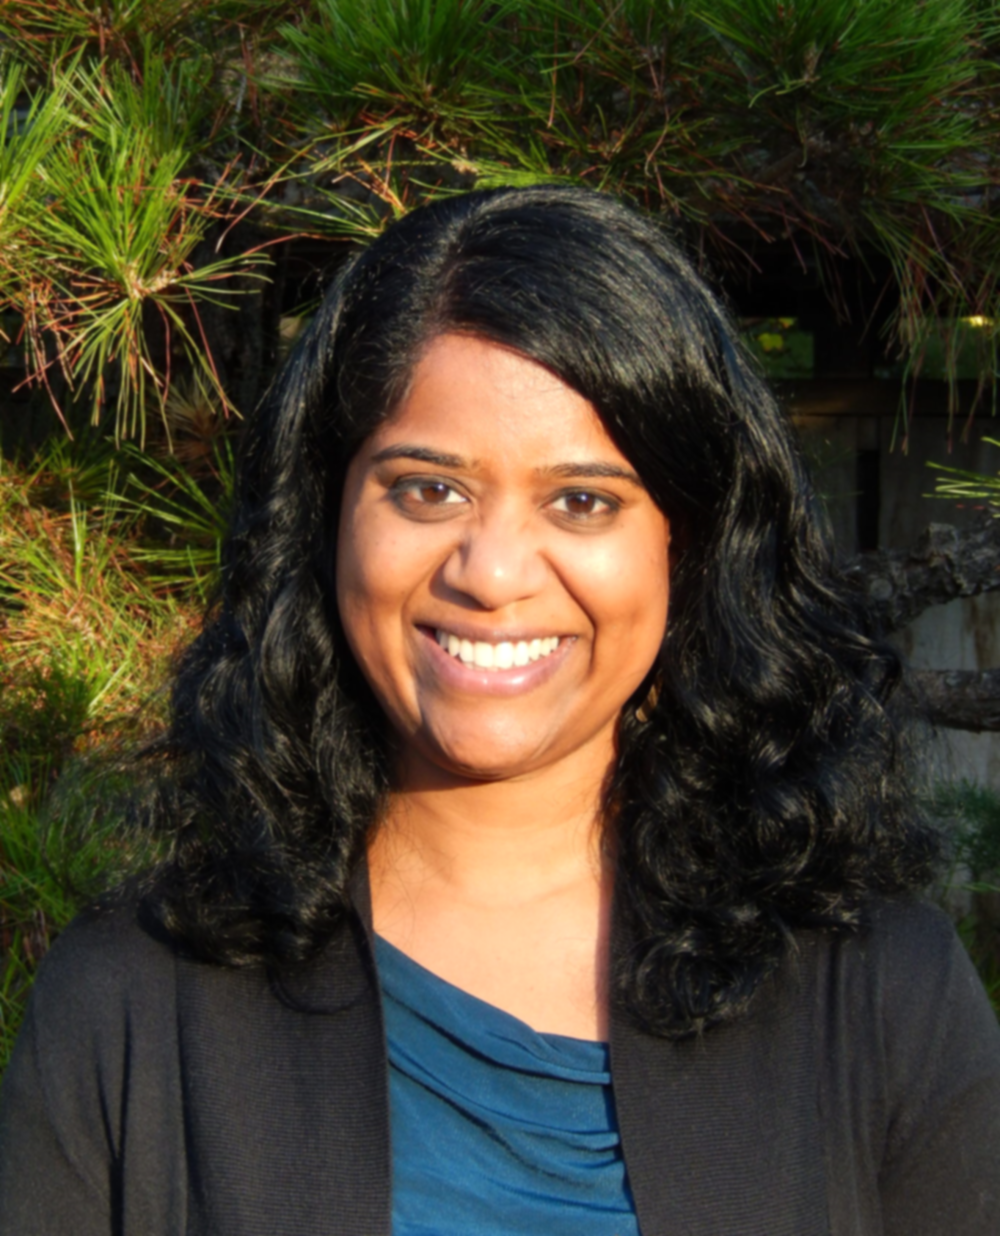 Poorni Otilingam, Ph.D.